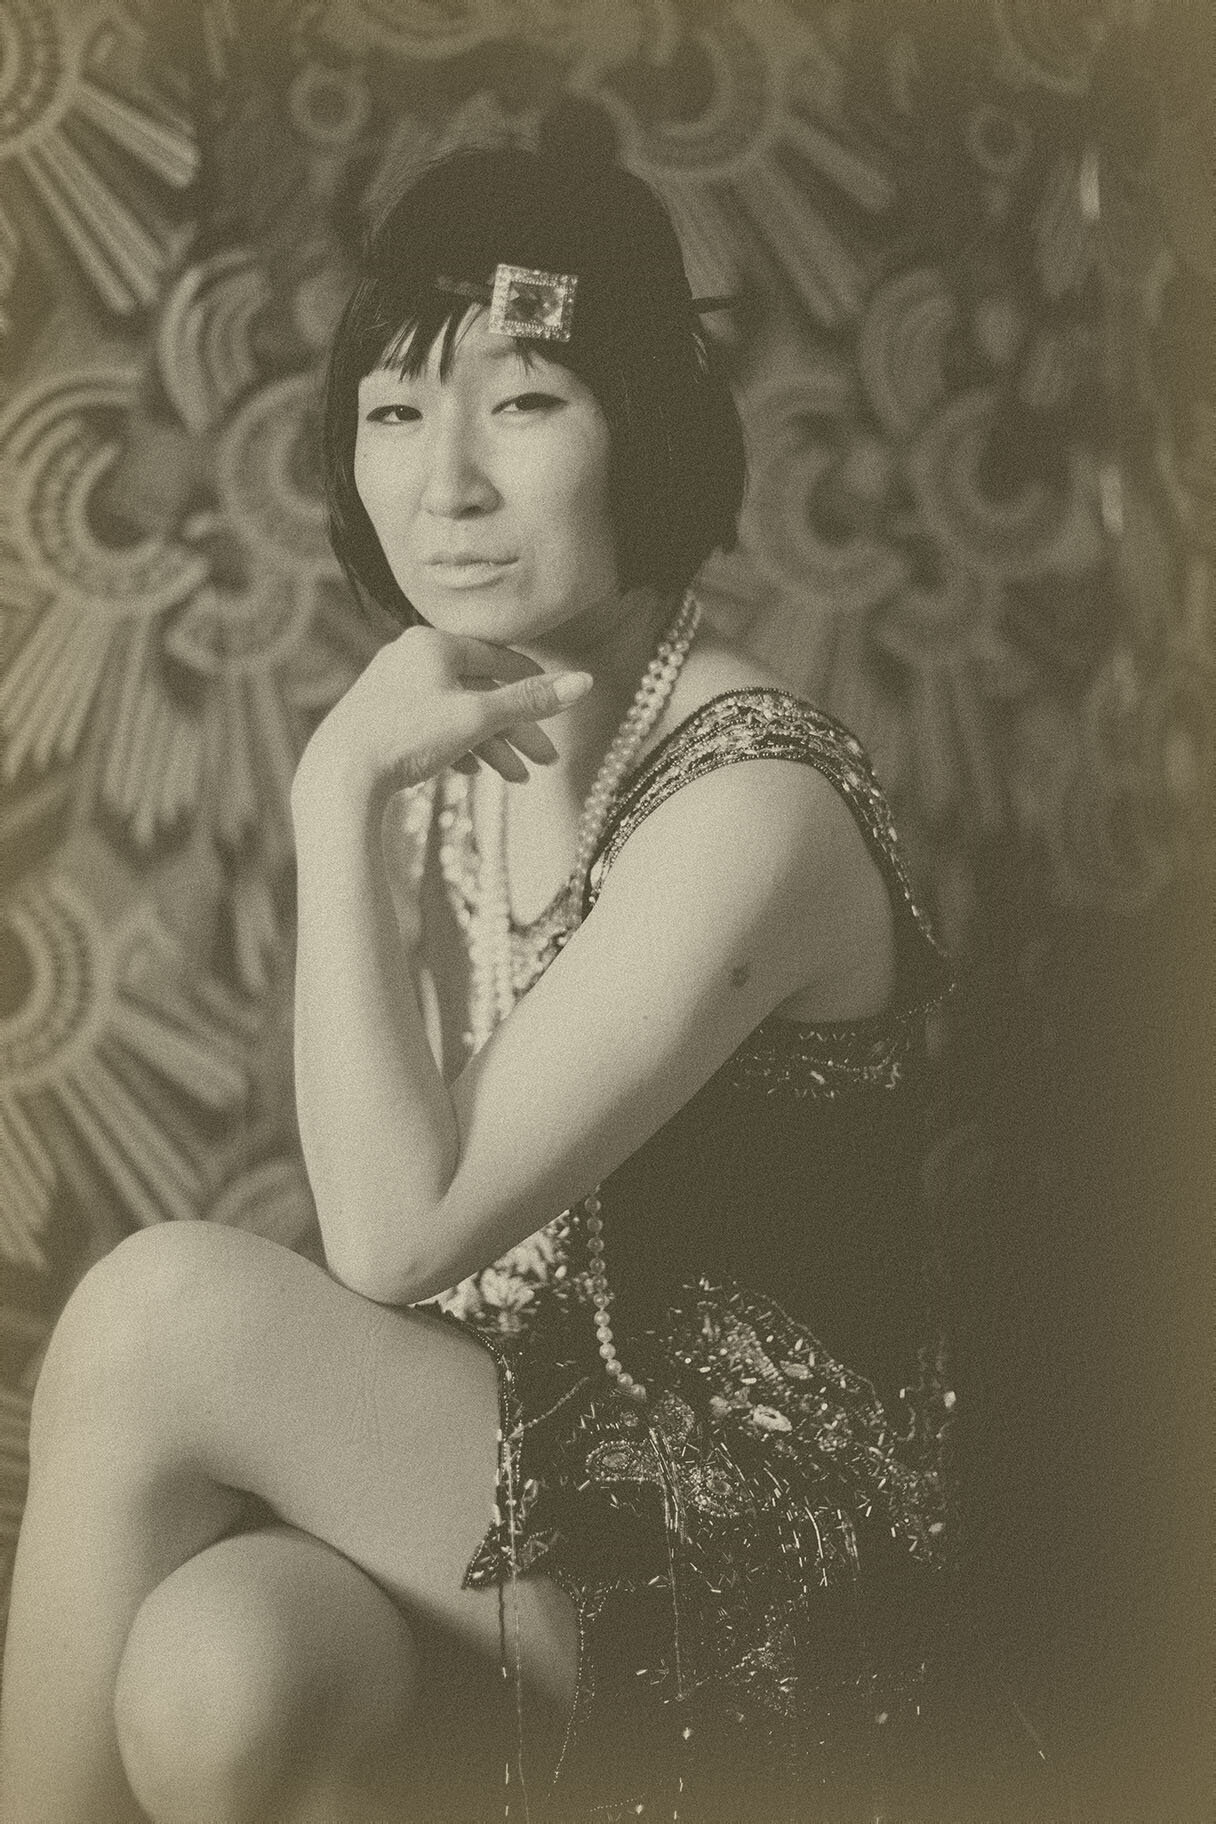 aya-takano-artist-new-york-perrotin-guillaume-ziccarelli-01.jpg